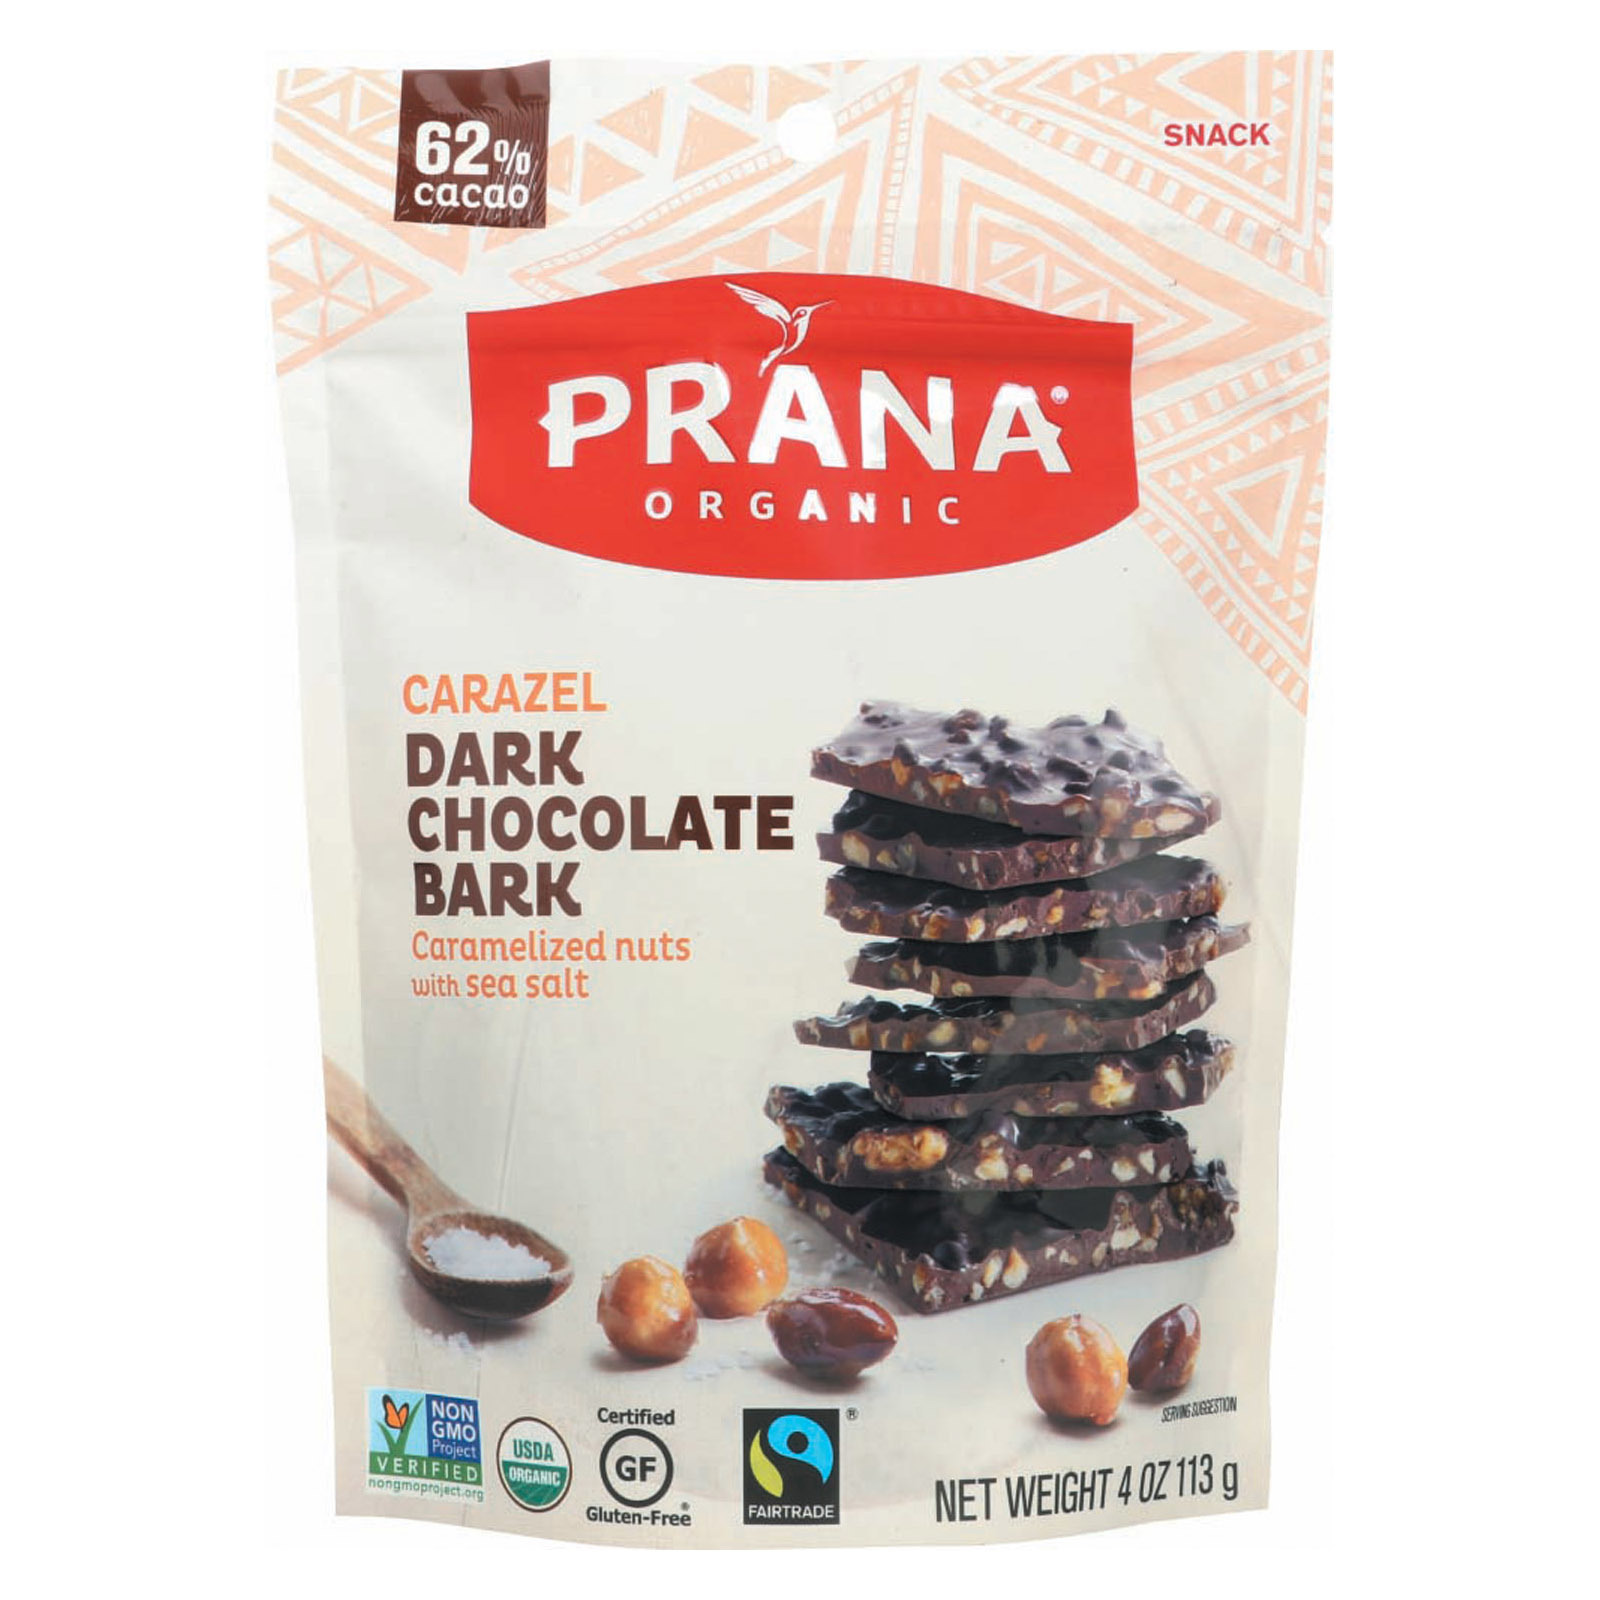 Prana Organics Organic 62% Chocolate Bark - Caramelized Nuts - Case of 8 - 4 oz